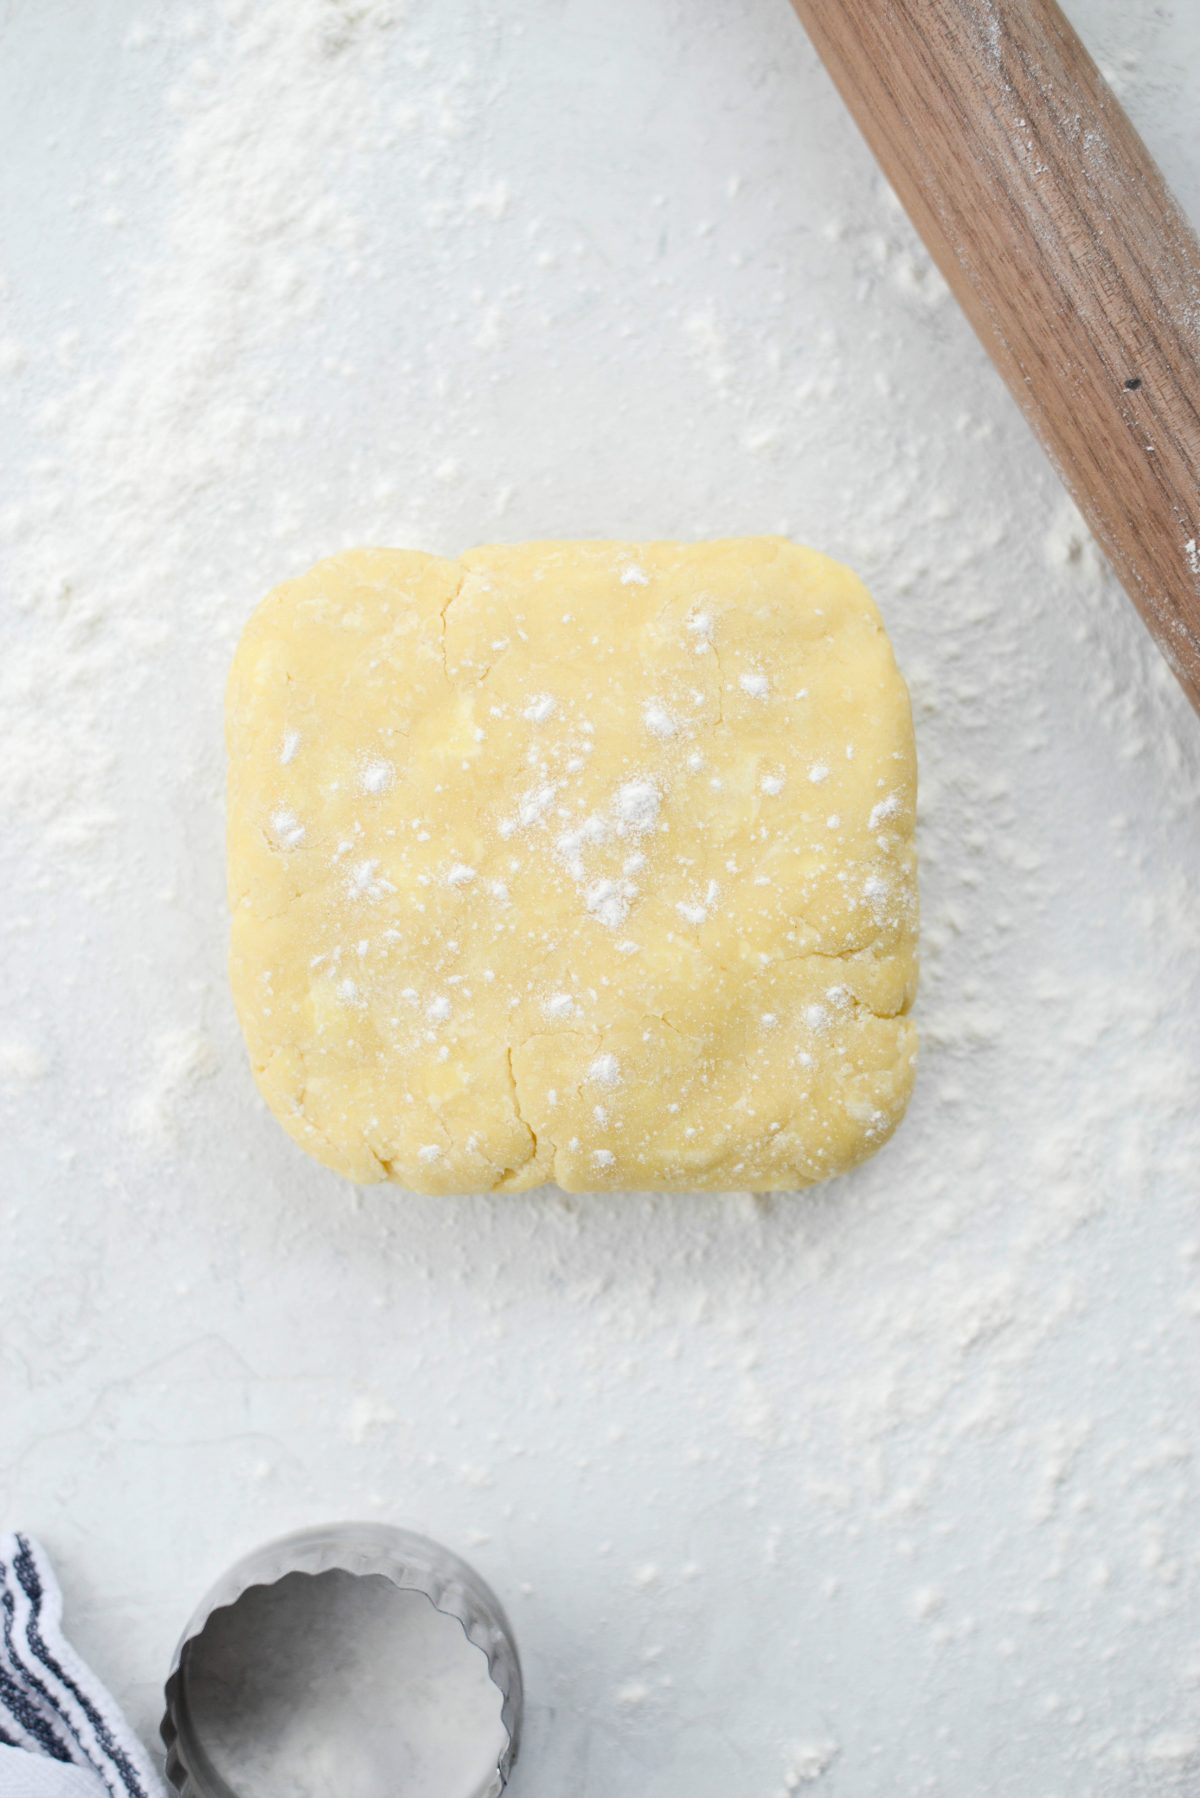 Easy Pâte Sucrée (Sweet Pastry Dough) l SimplyScratch.com